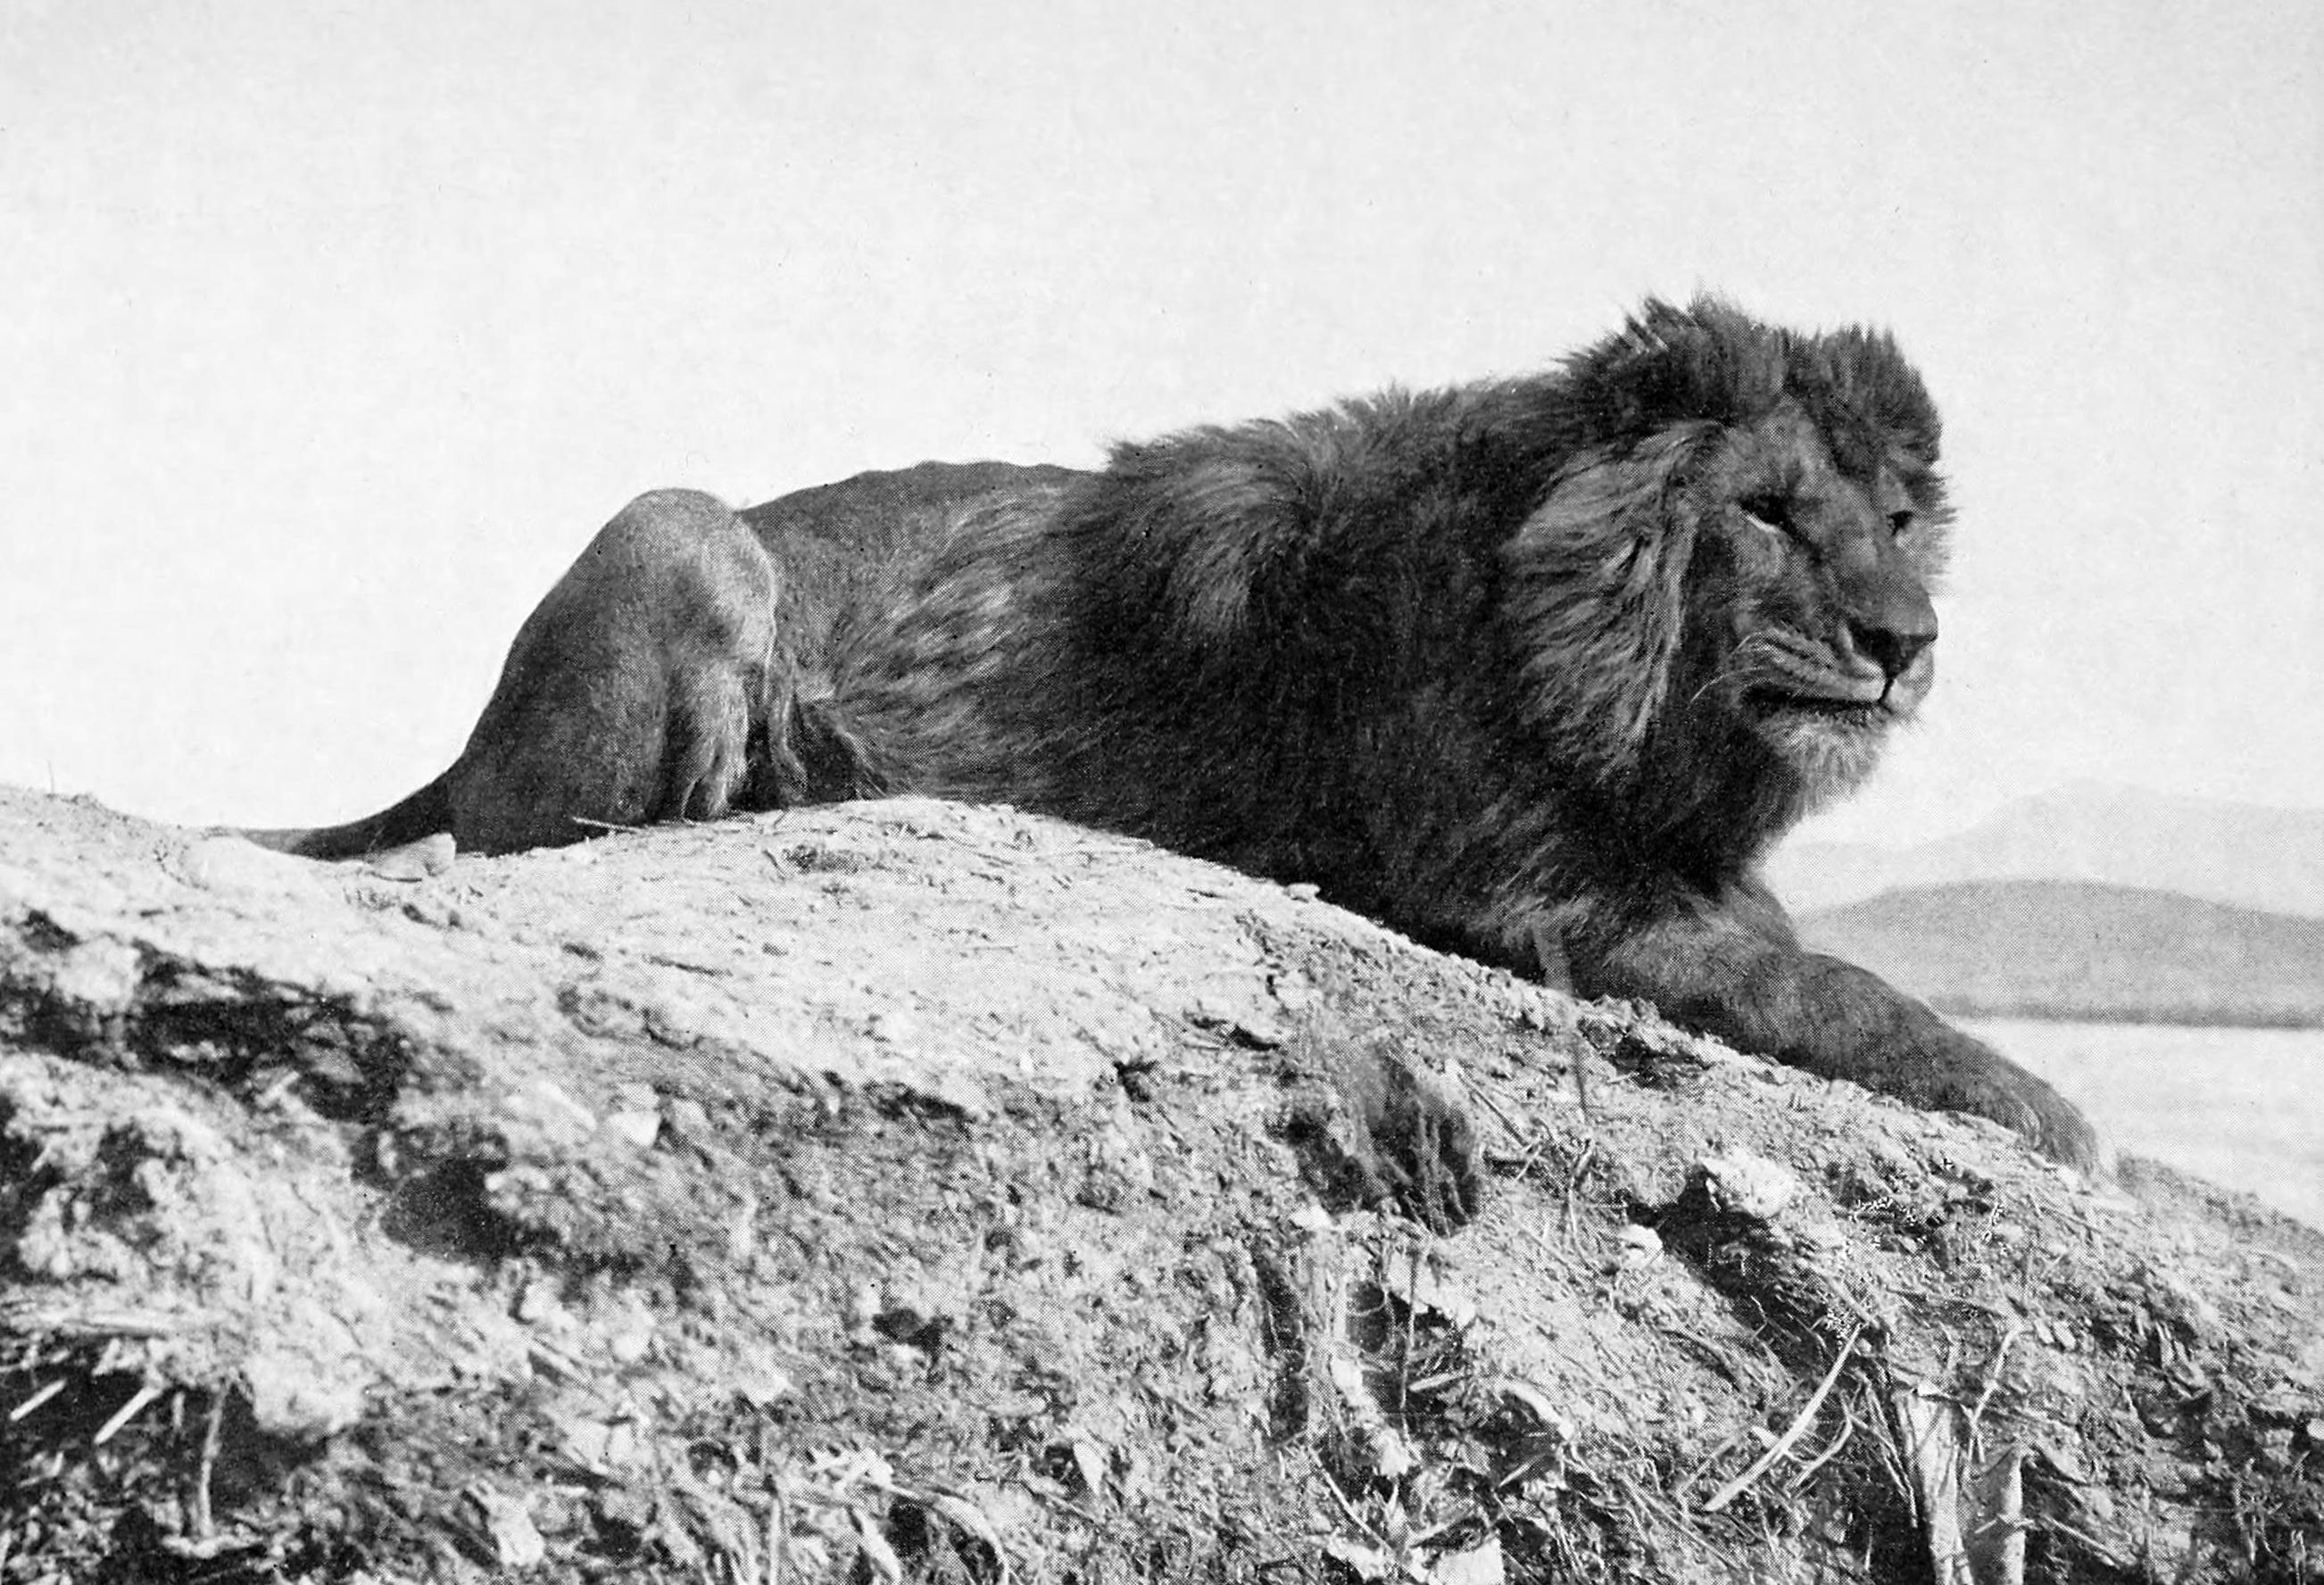 https://i0.wp.com/upload.wikimedia.org/wikipedia/commons/4/43/Barbary_lion.jpg